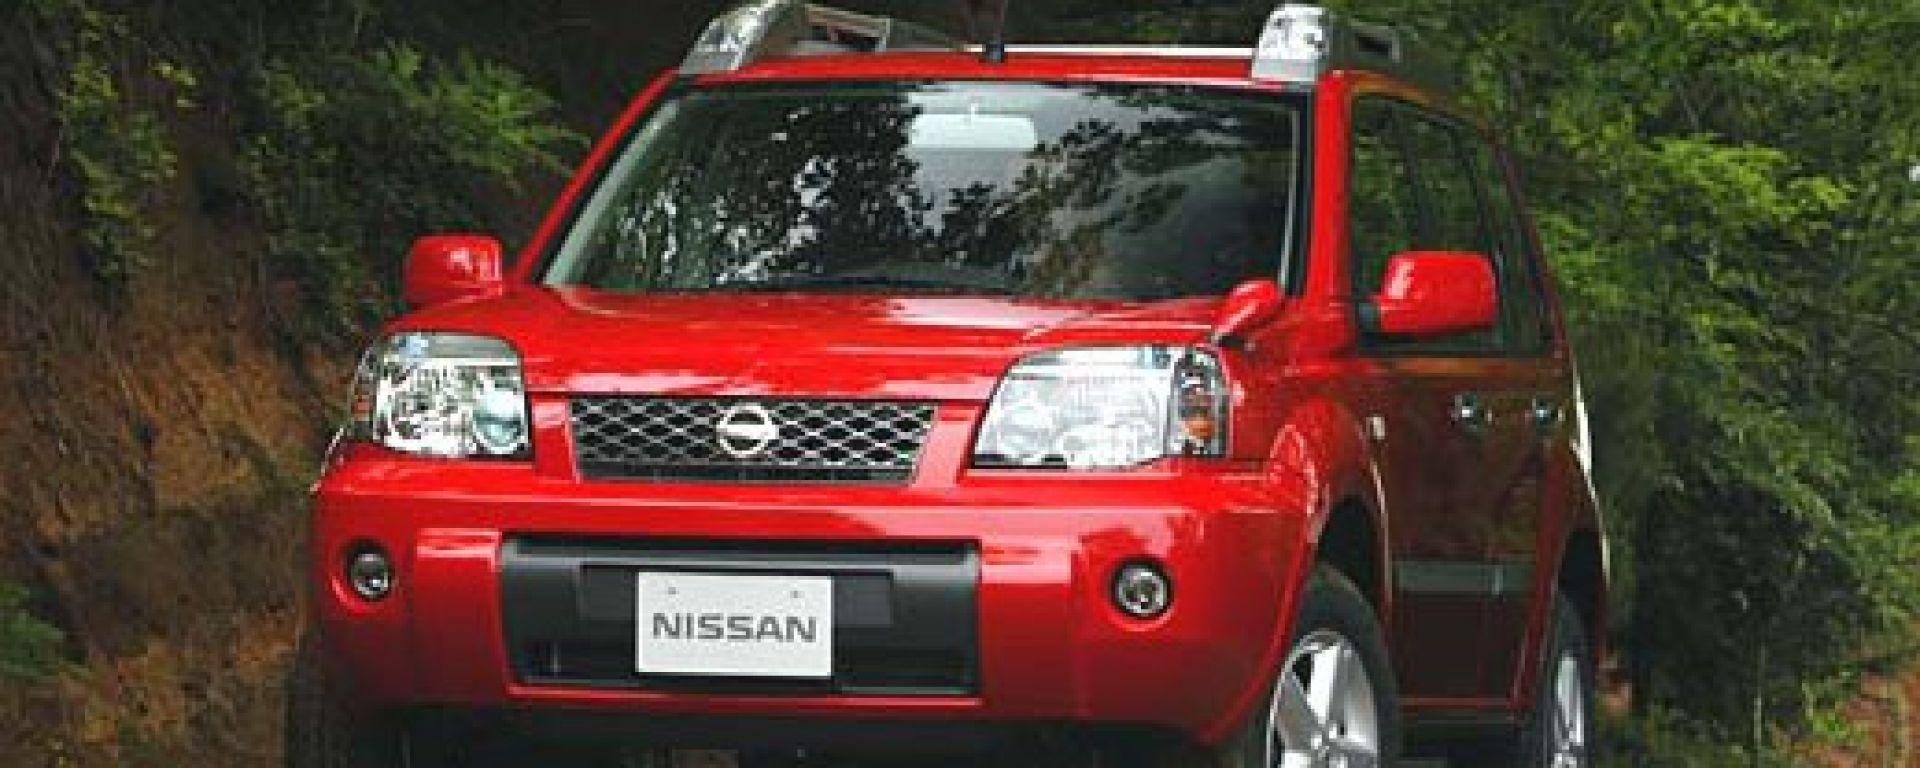 Anteprima:Nissan X-Trail 2003